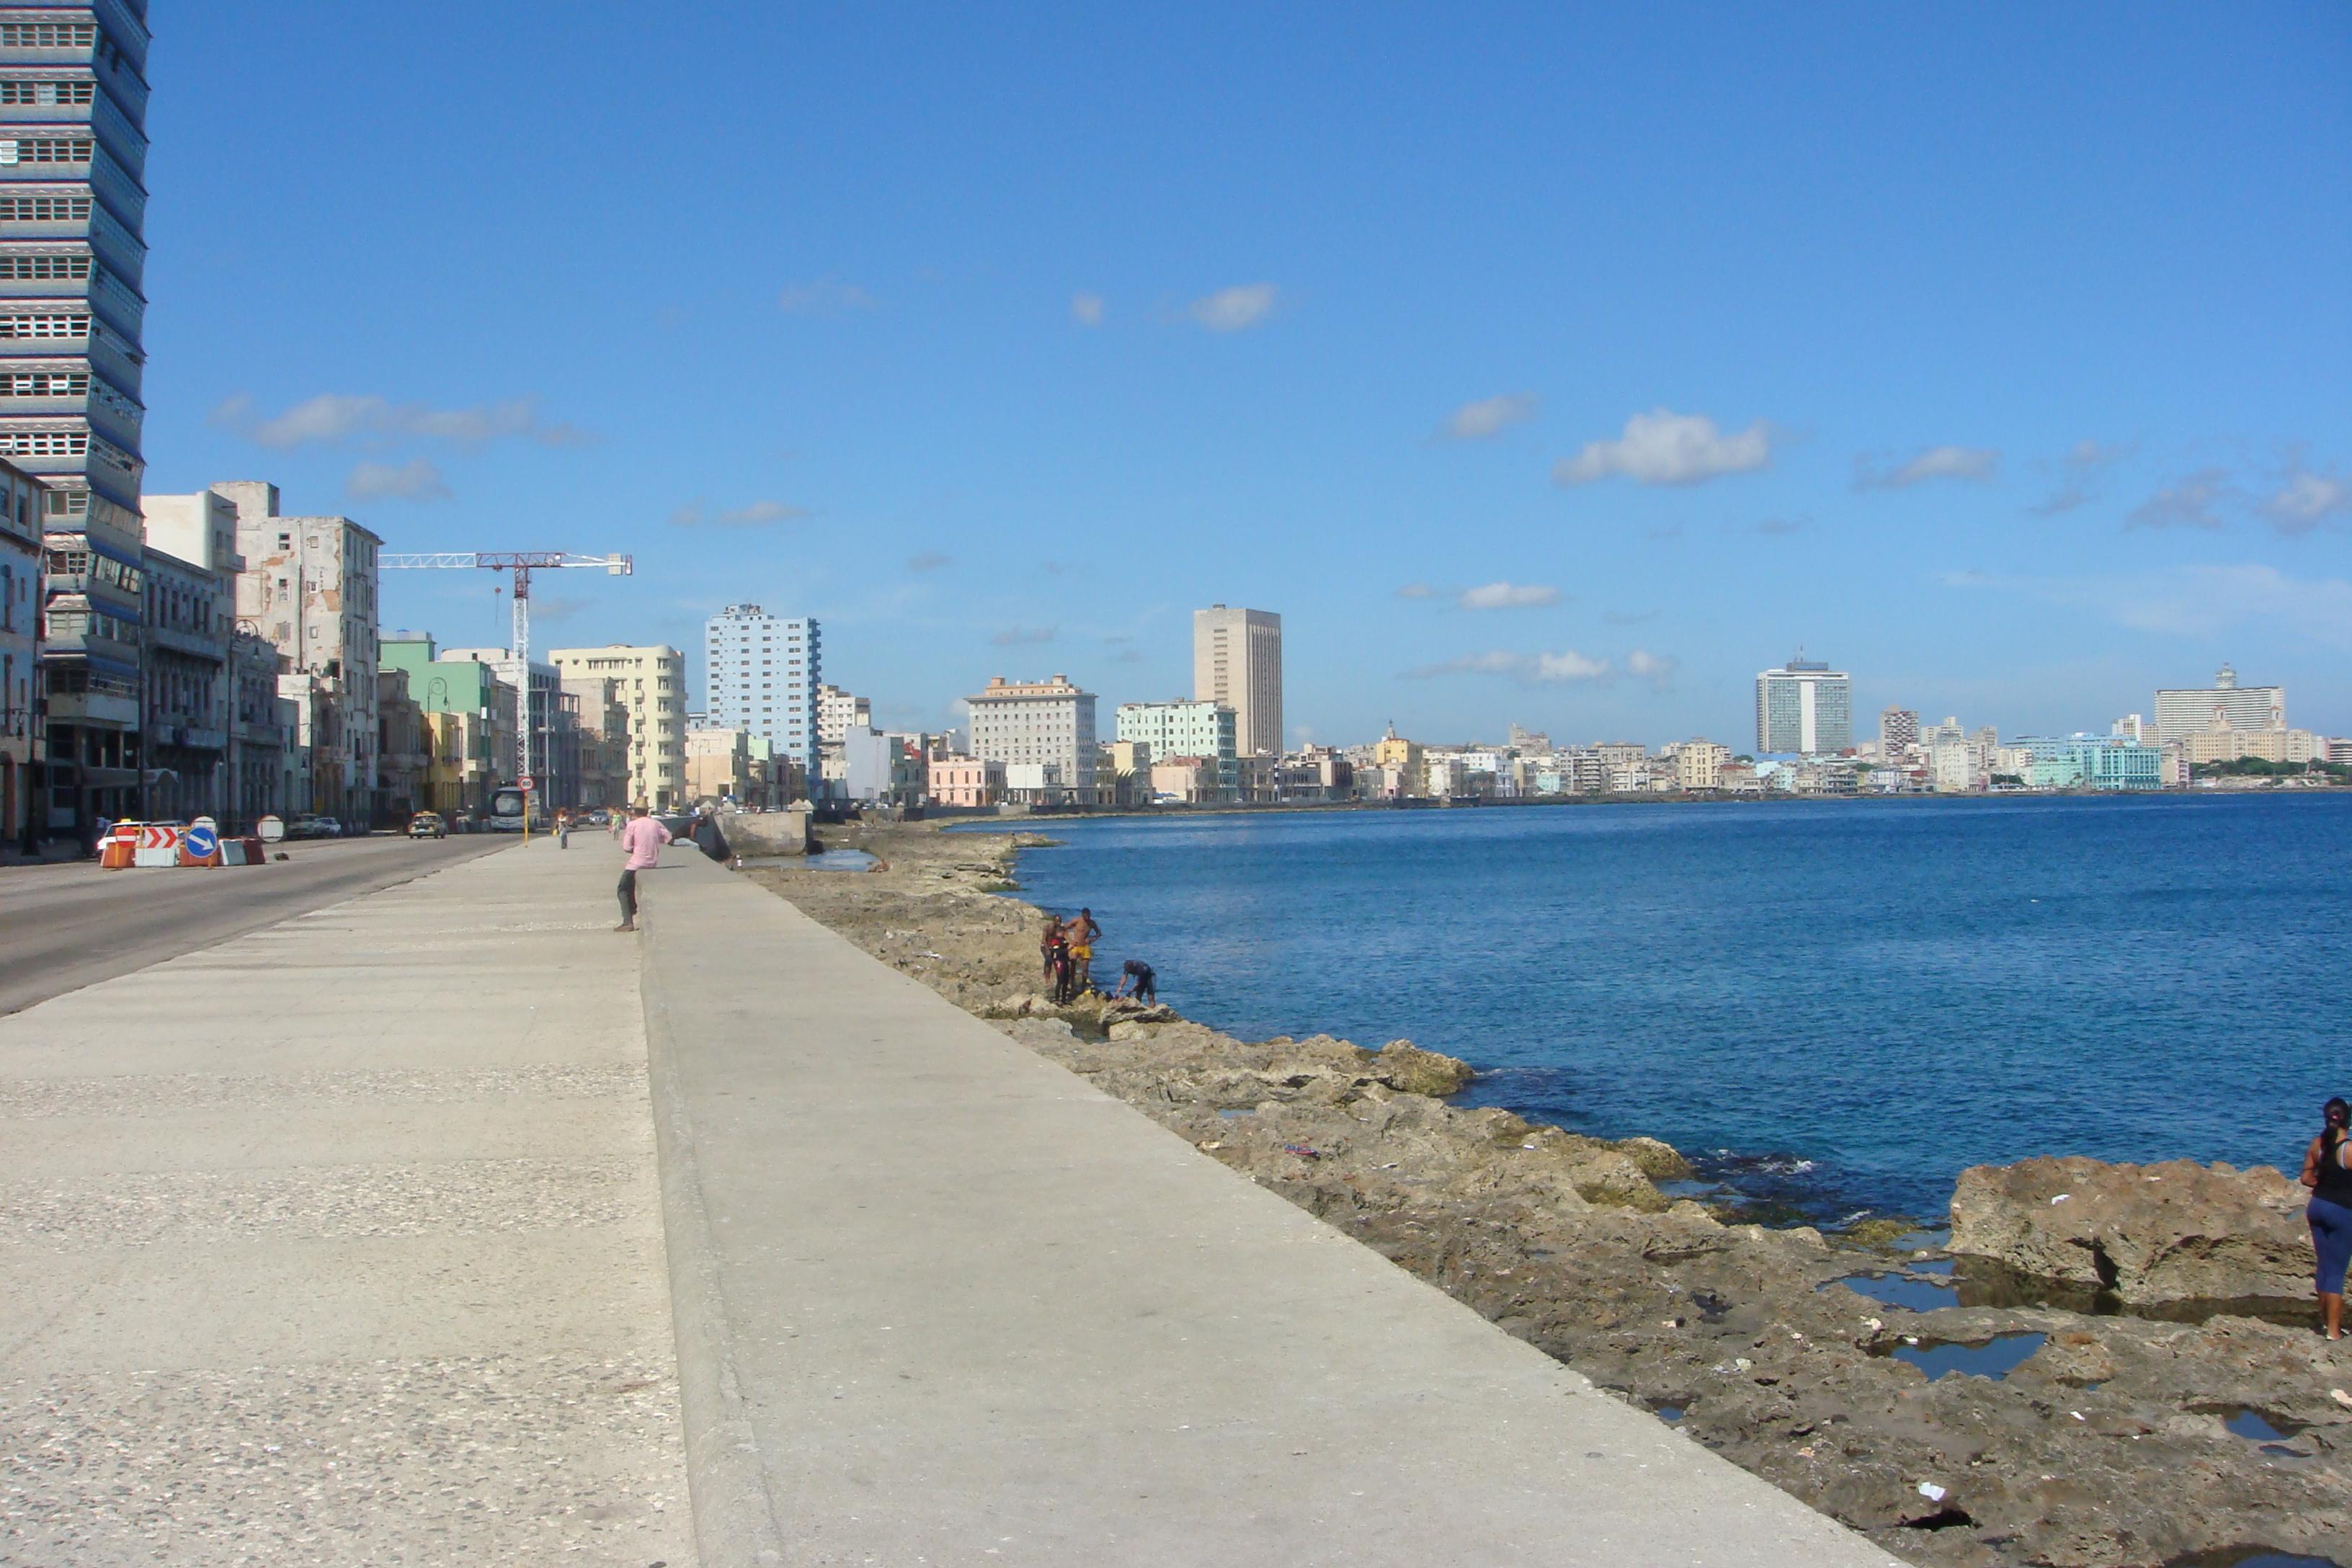 La Habana: un destino prometedor